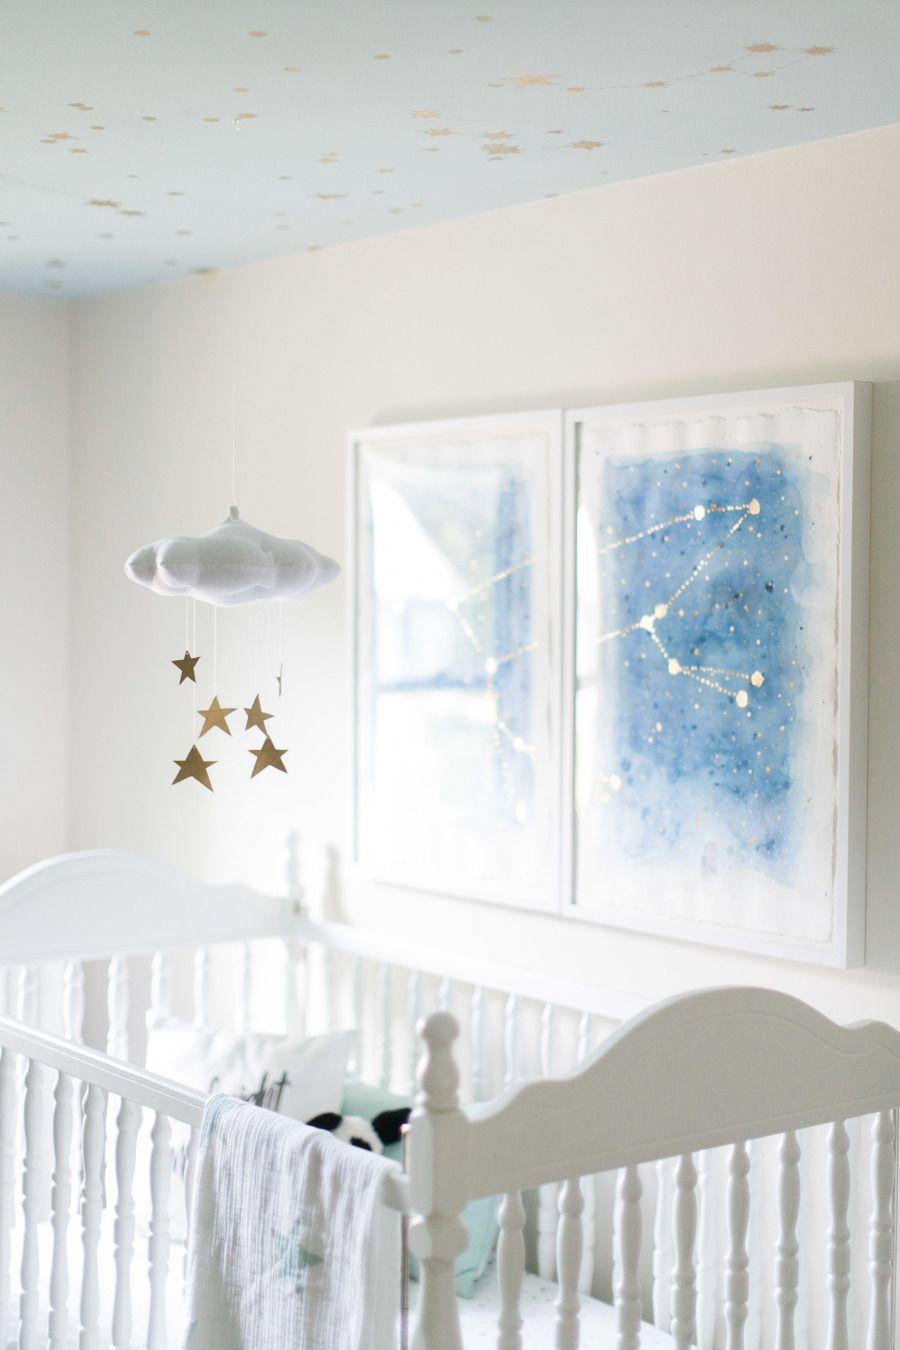 Sweet star-themed nursery with DIY constellation art